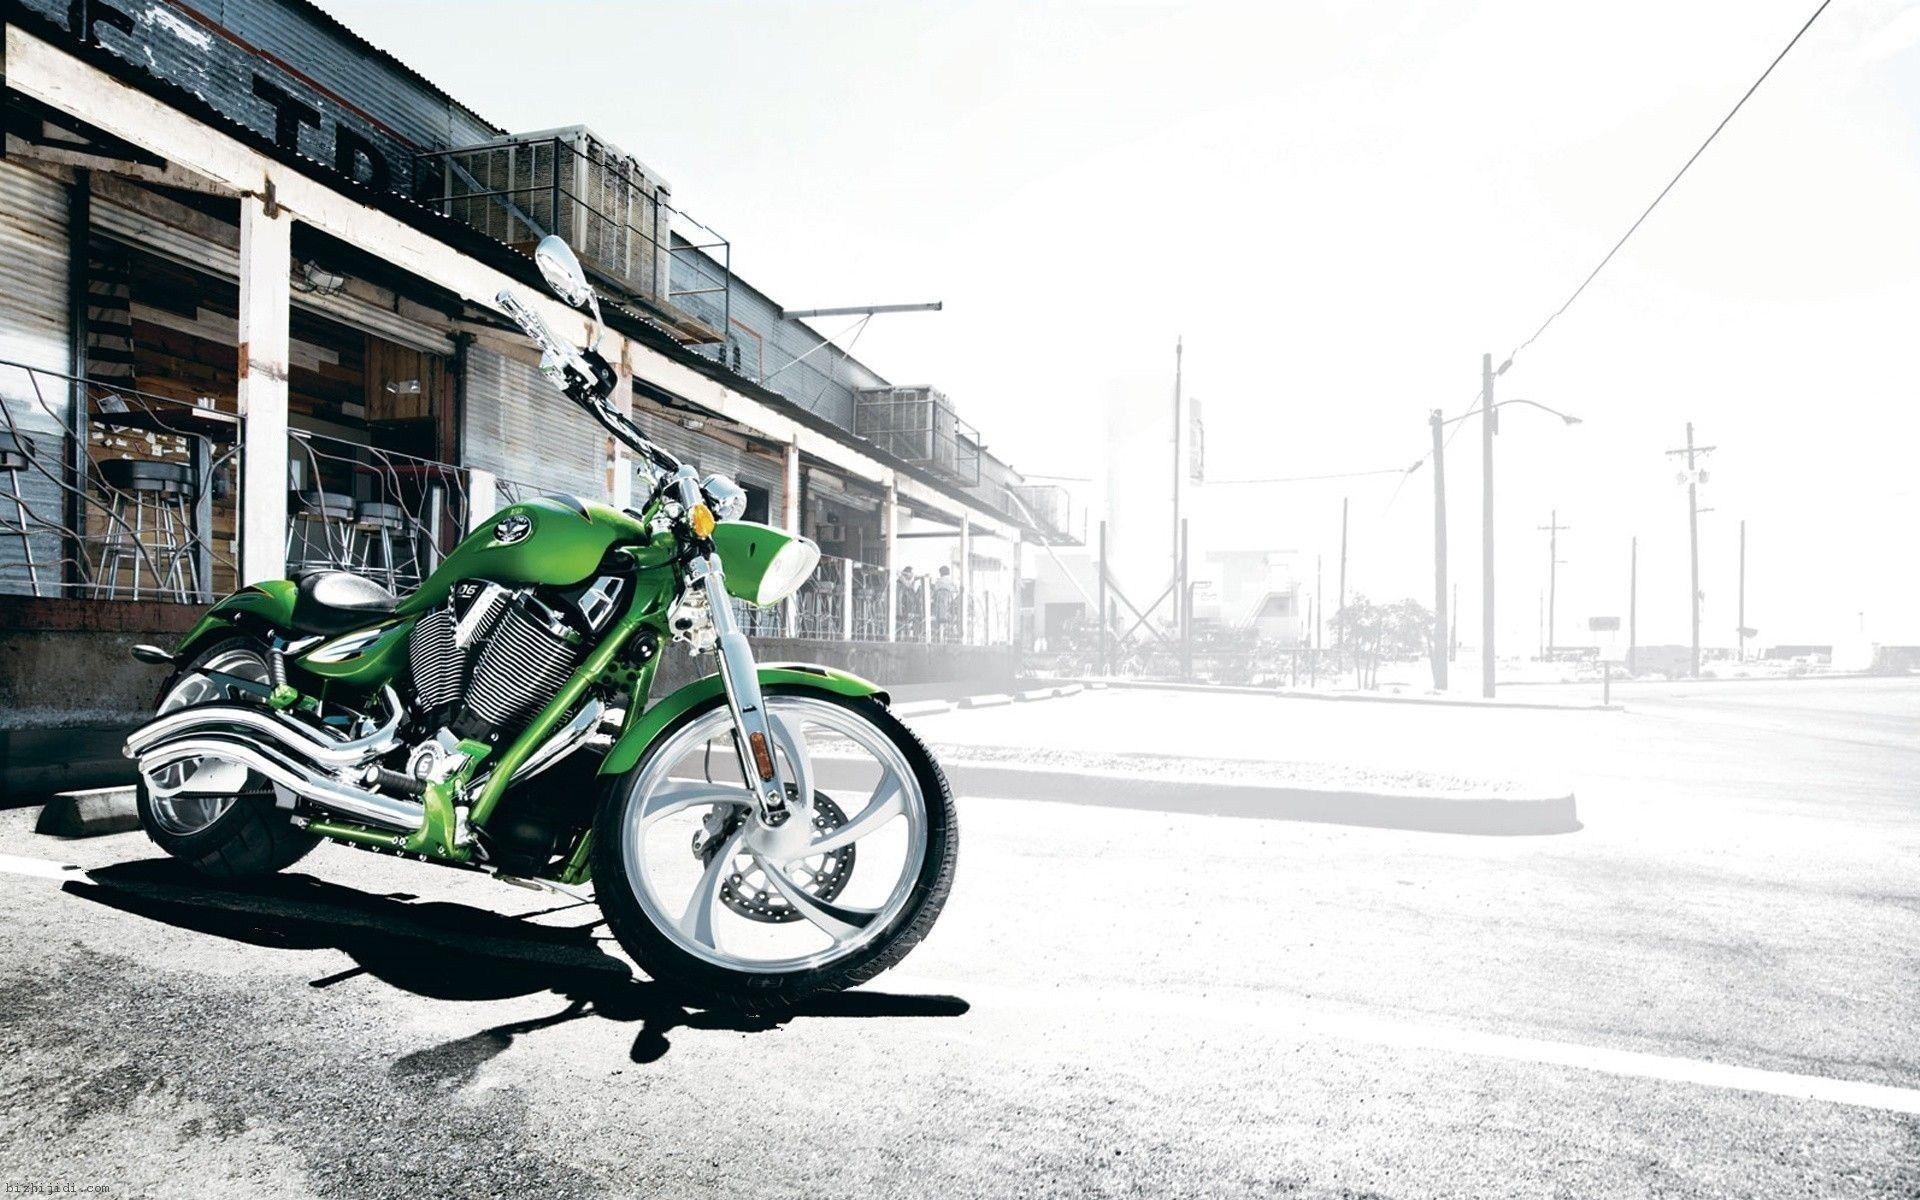 cruiser motorcycle wallpaper hd - photo #16